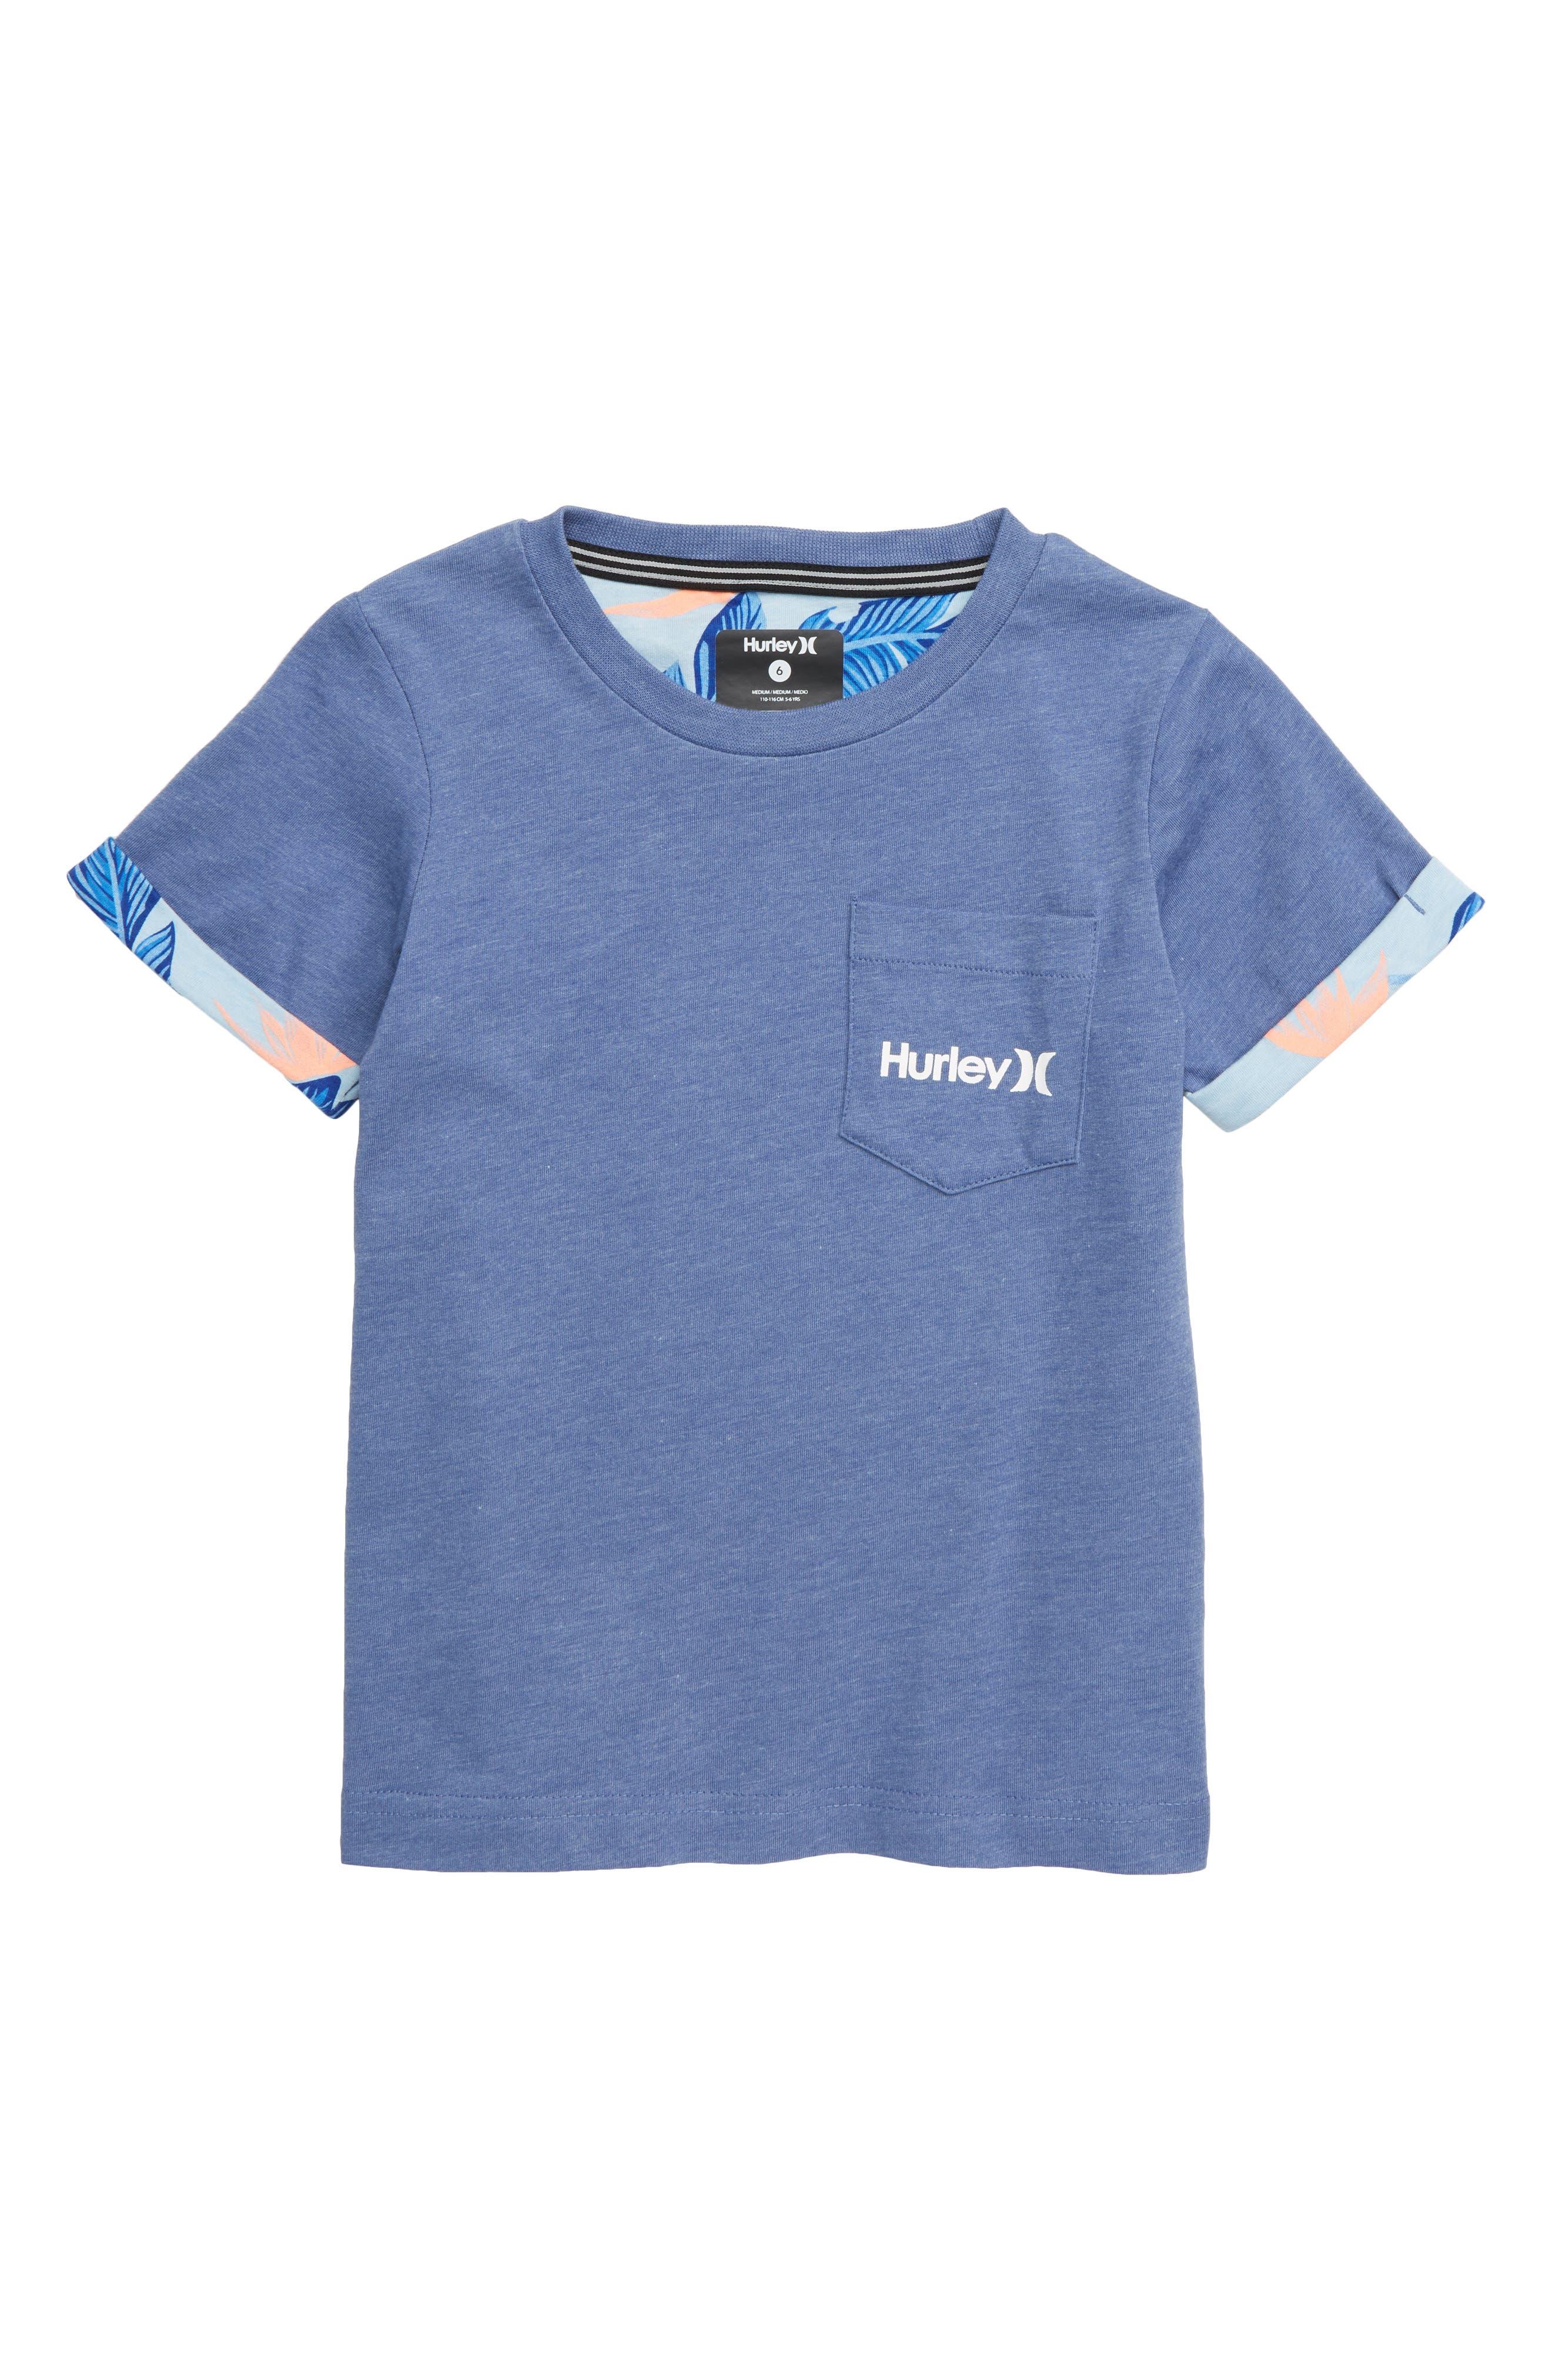 HURLEY, Paradise Roll Cuff T-Shirt, Main thumbnail 1, color, 463